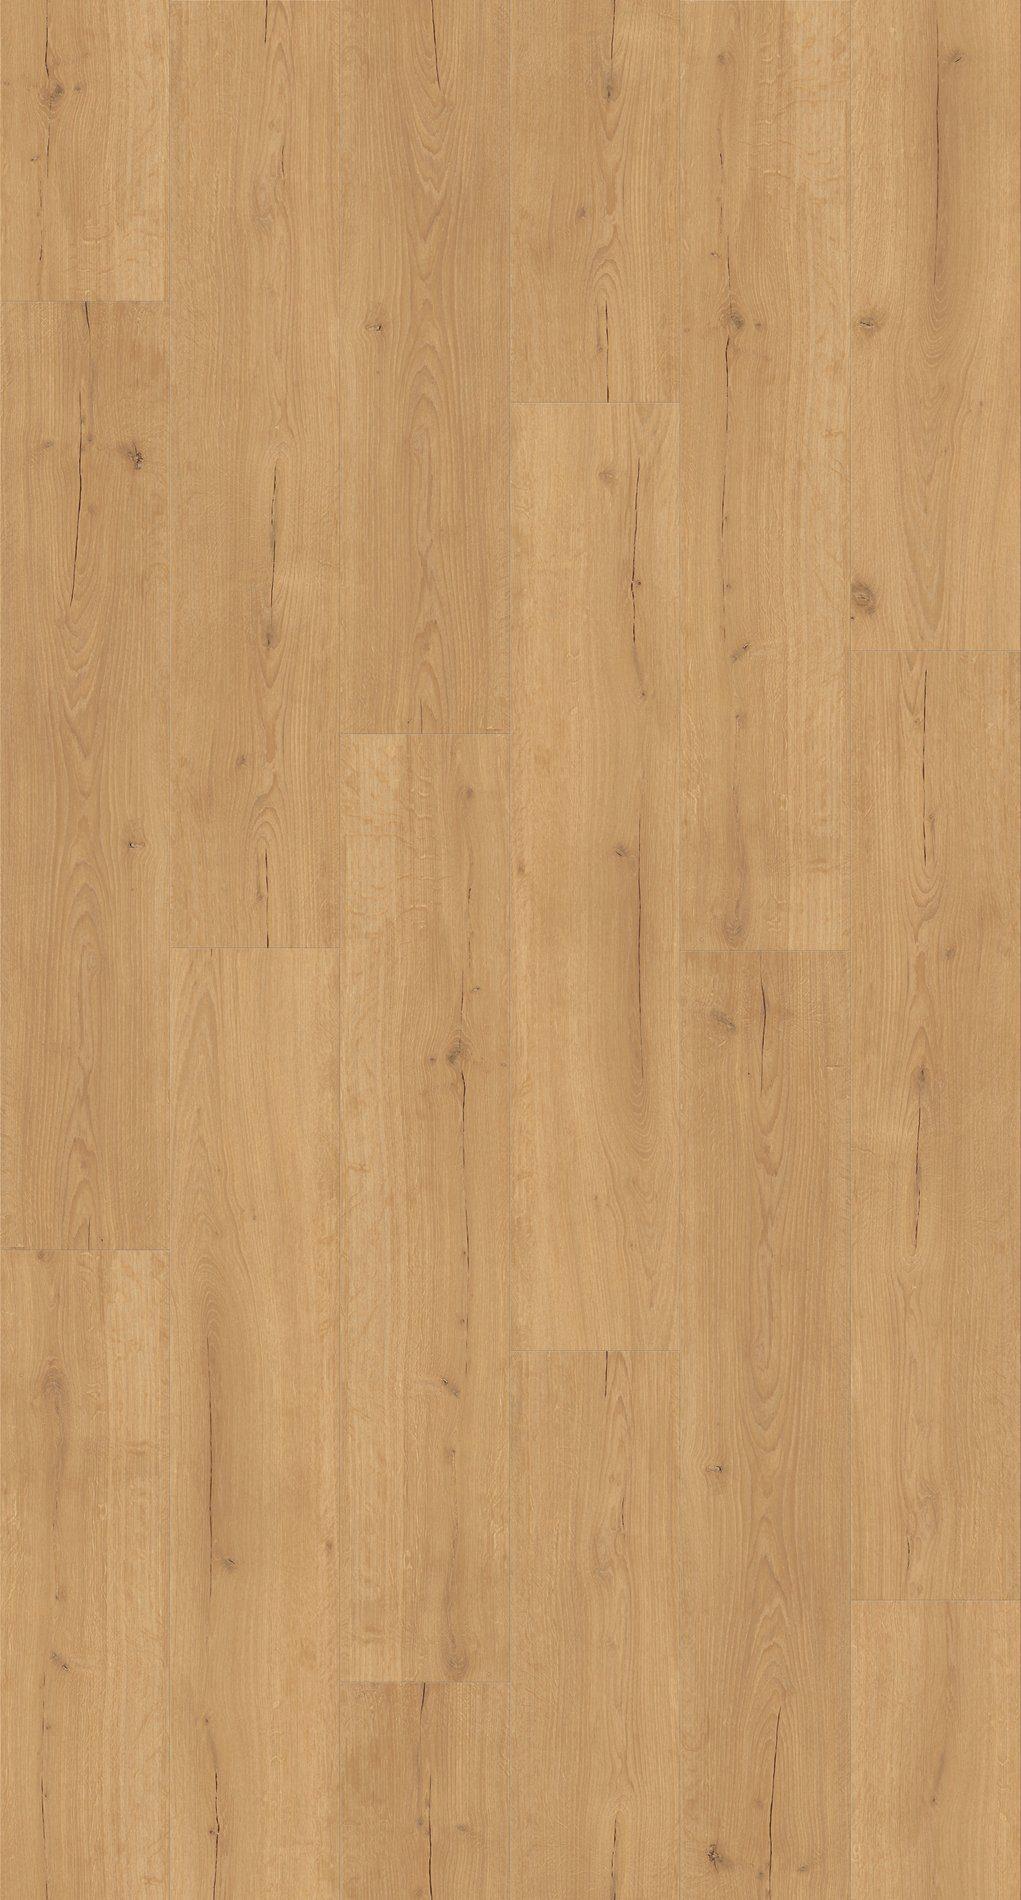 PARADOR Packung: Vinylboden »Basic 4.3 - Eiche Infinity Natur«, 1211 x 219 x 4,3 mm, 2,4 m²